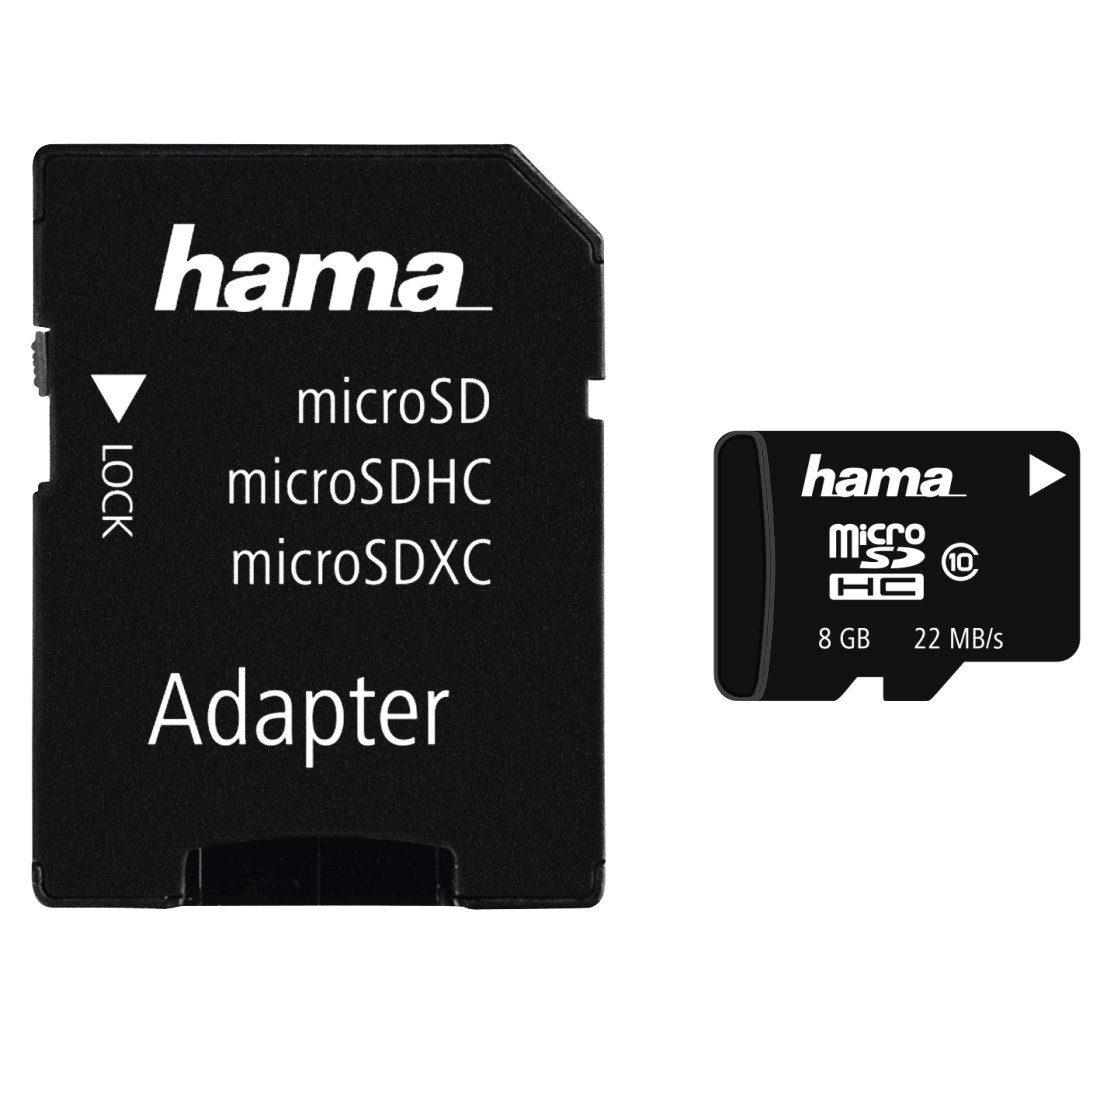 Hama Speicherkarte microSDHC, 8GB, Class 10 »inkl. SD-Karten Adapter«